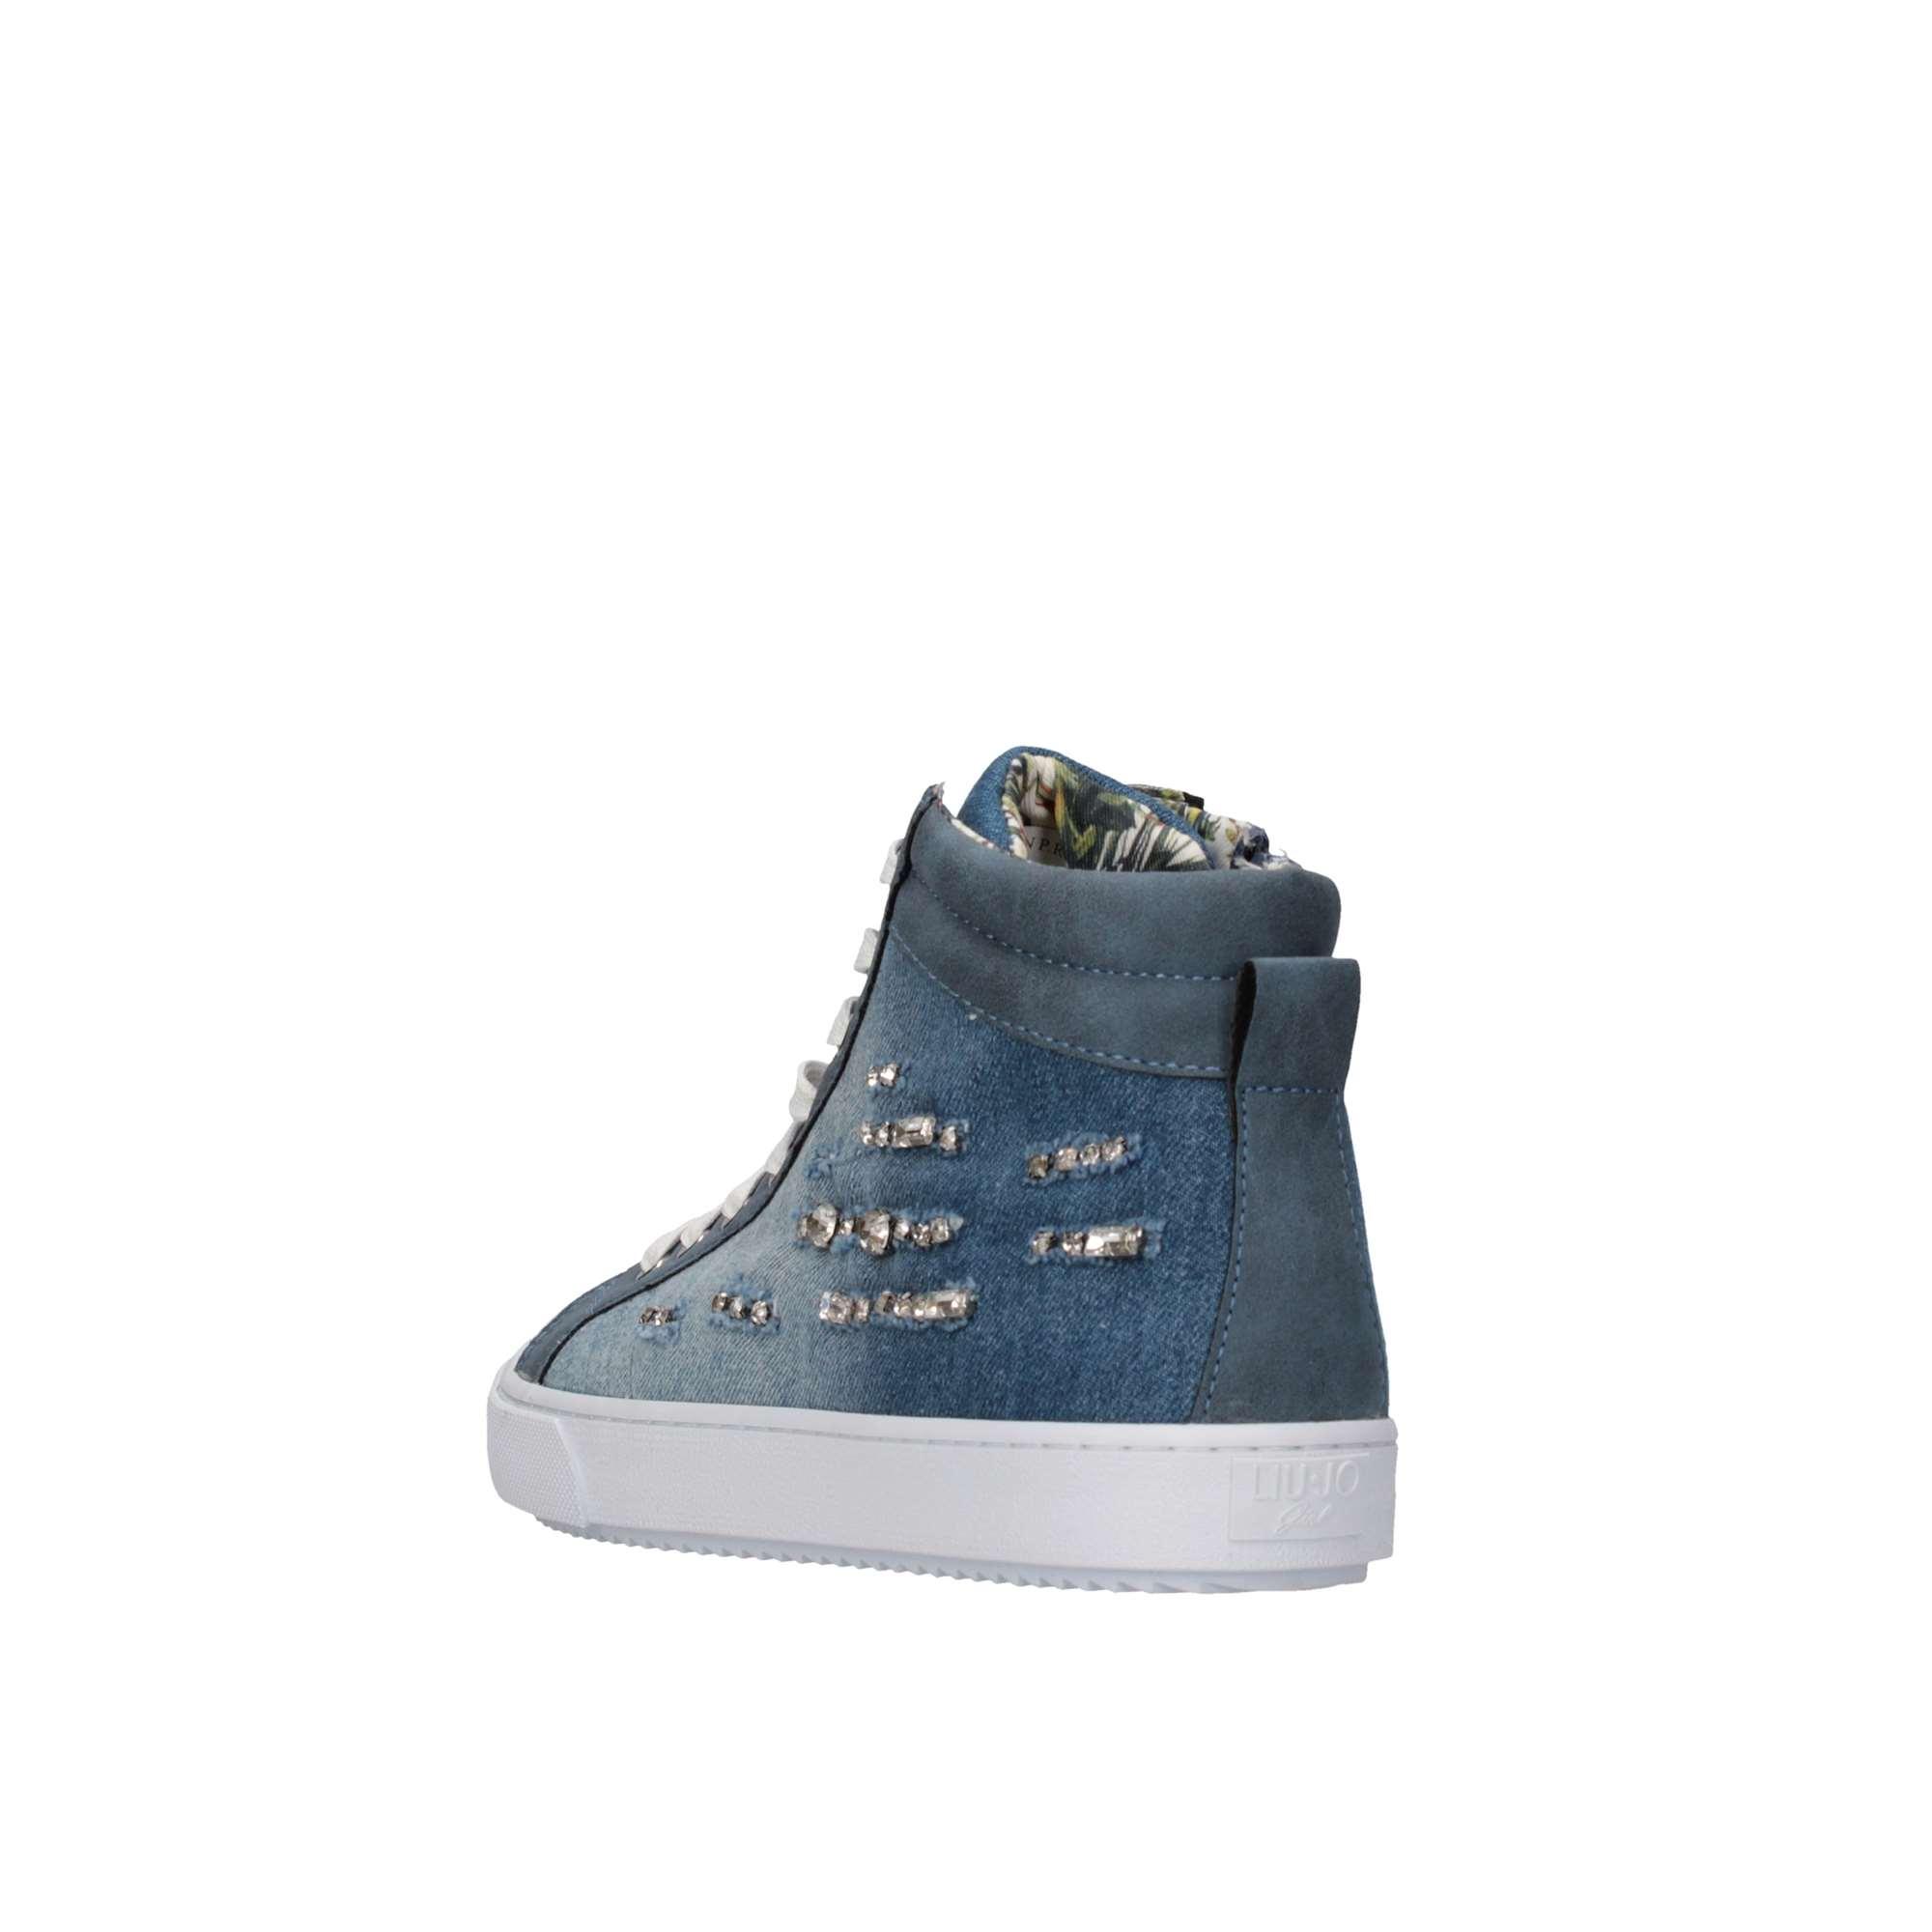 Sneakers-Donna-Liu-Jo-Girl-UM22929-Primavera-Estate